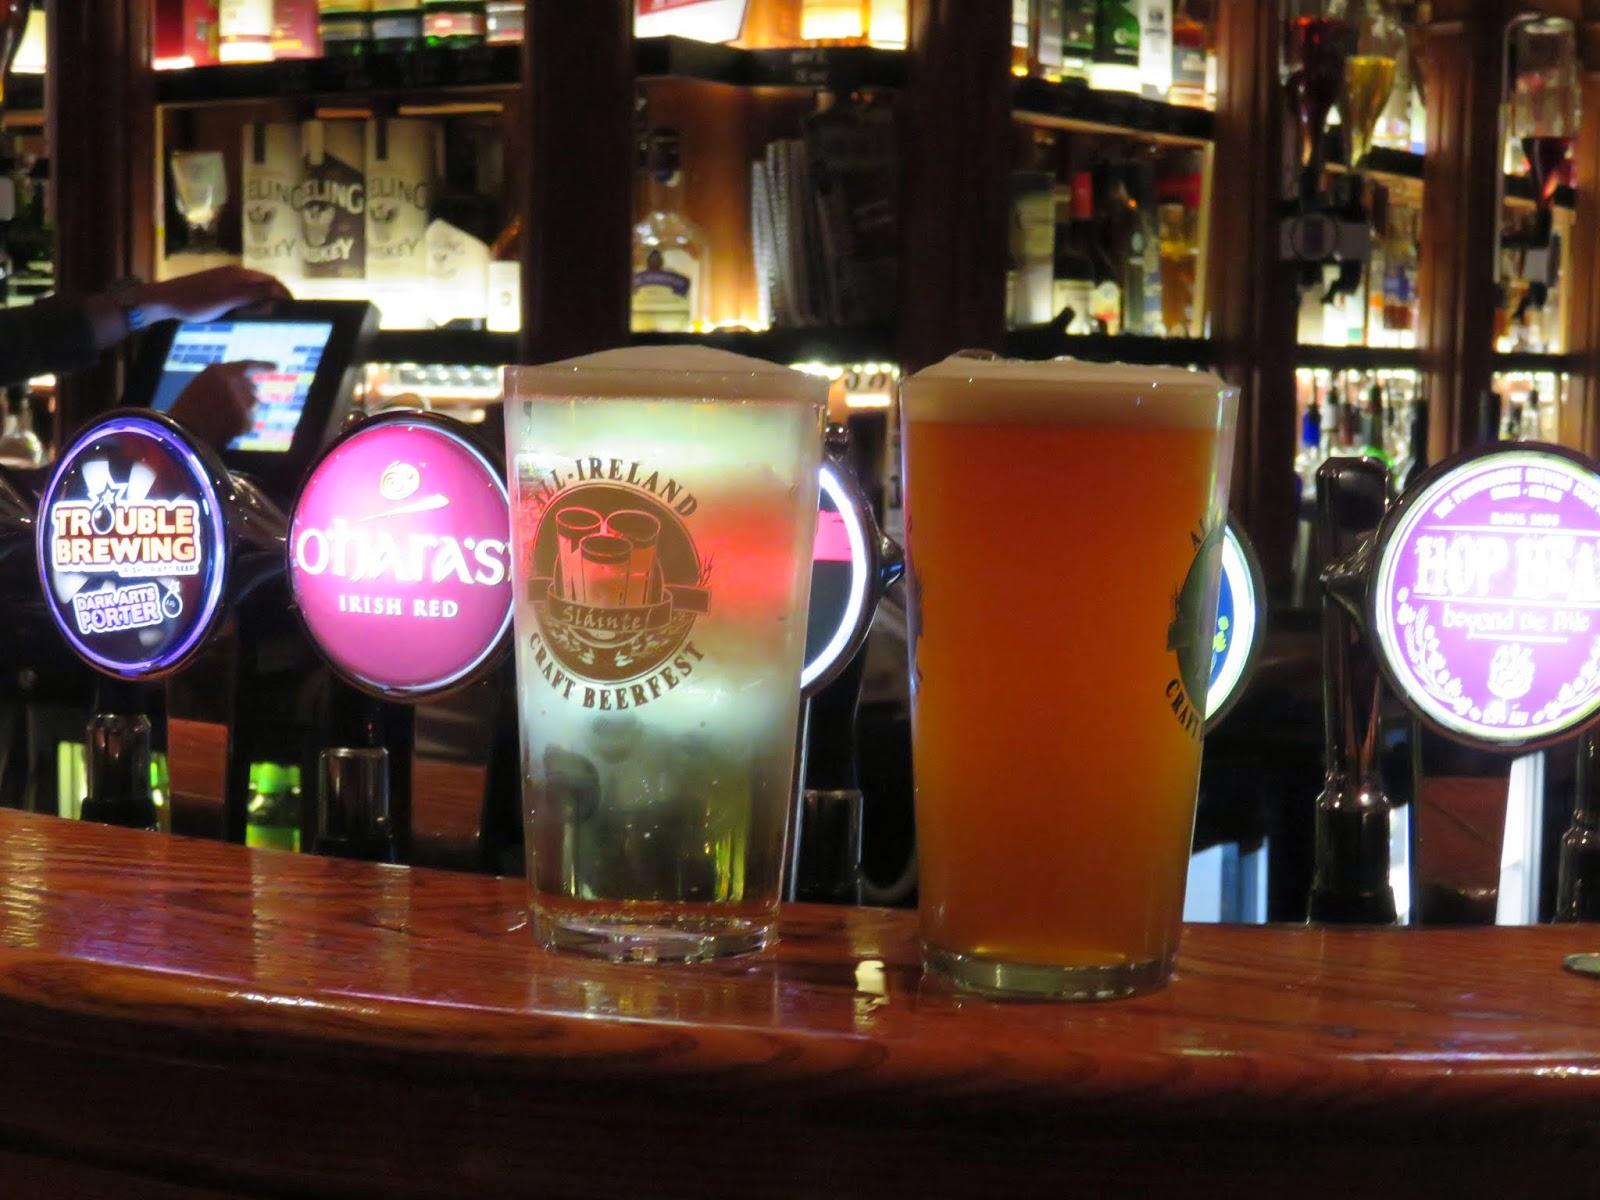 Irish Craft Beer Taps at 57 The Headline in Dublin